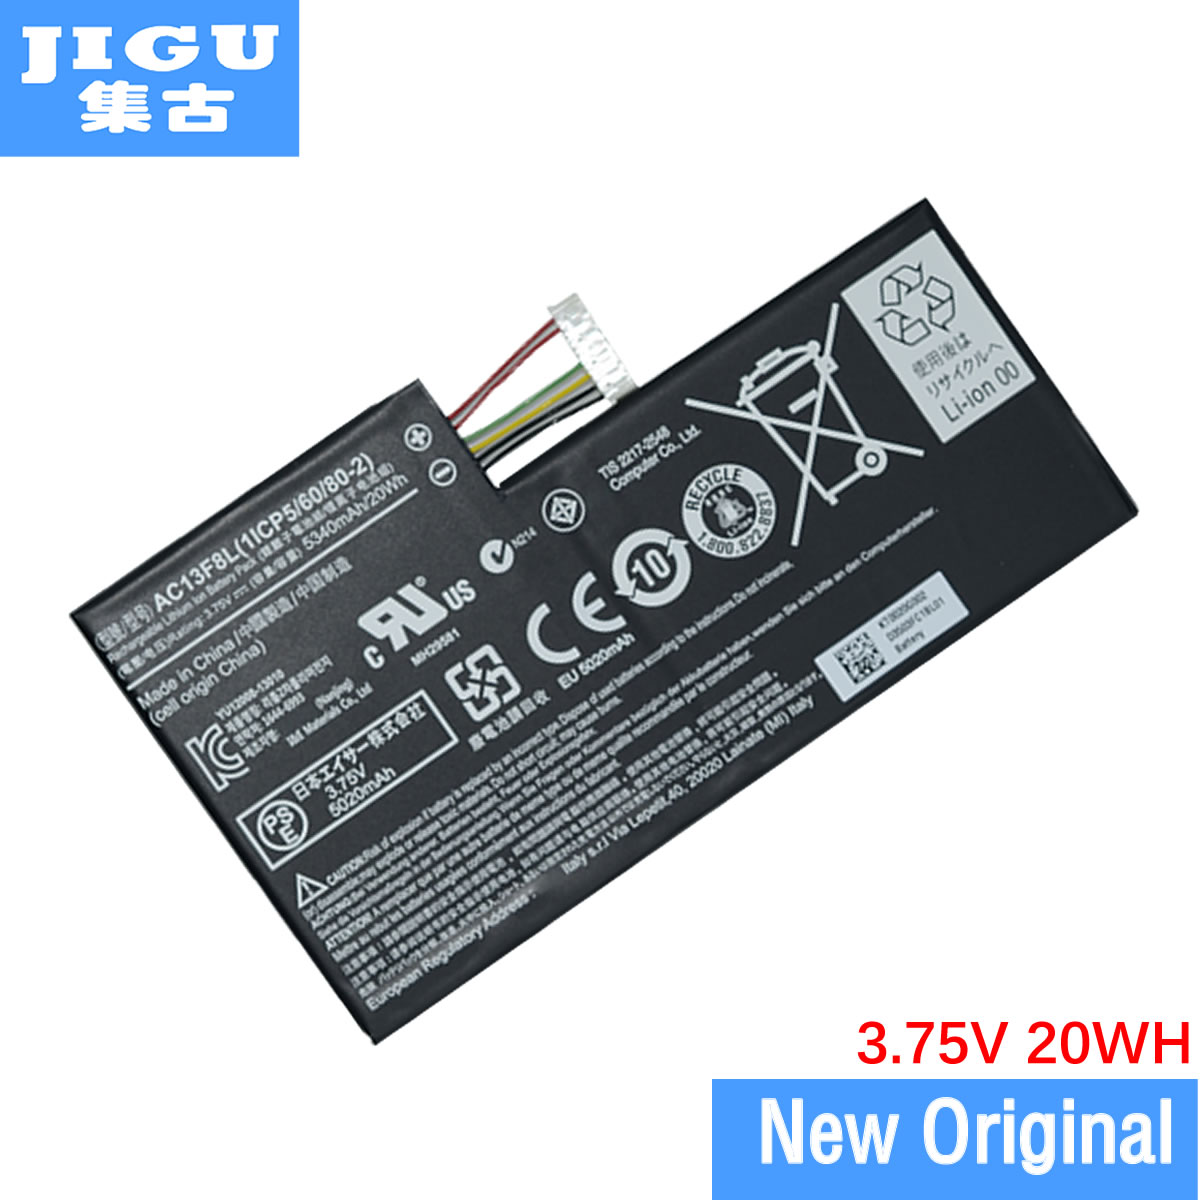 JIGU 1ICP5/60/80-2 Batteria PER Acer Iconia Tab A1-810 AC13F8L A1-811 W4-W4-820p 1CP5/60/80-2 AC13F3L LAptop Tablet PC